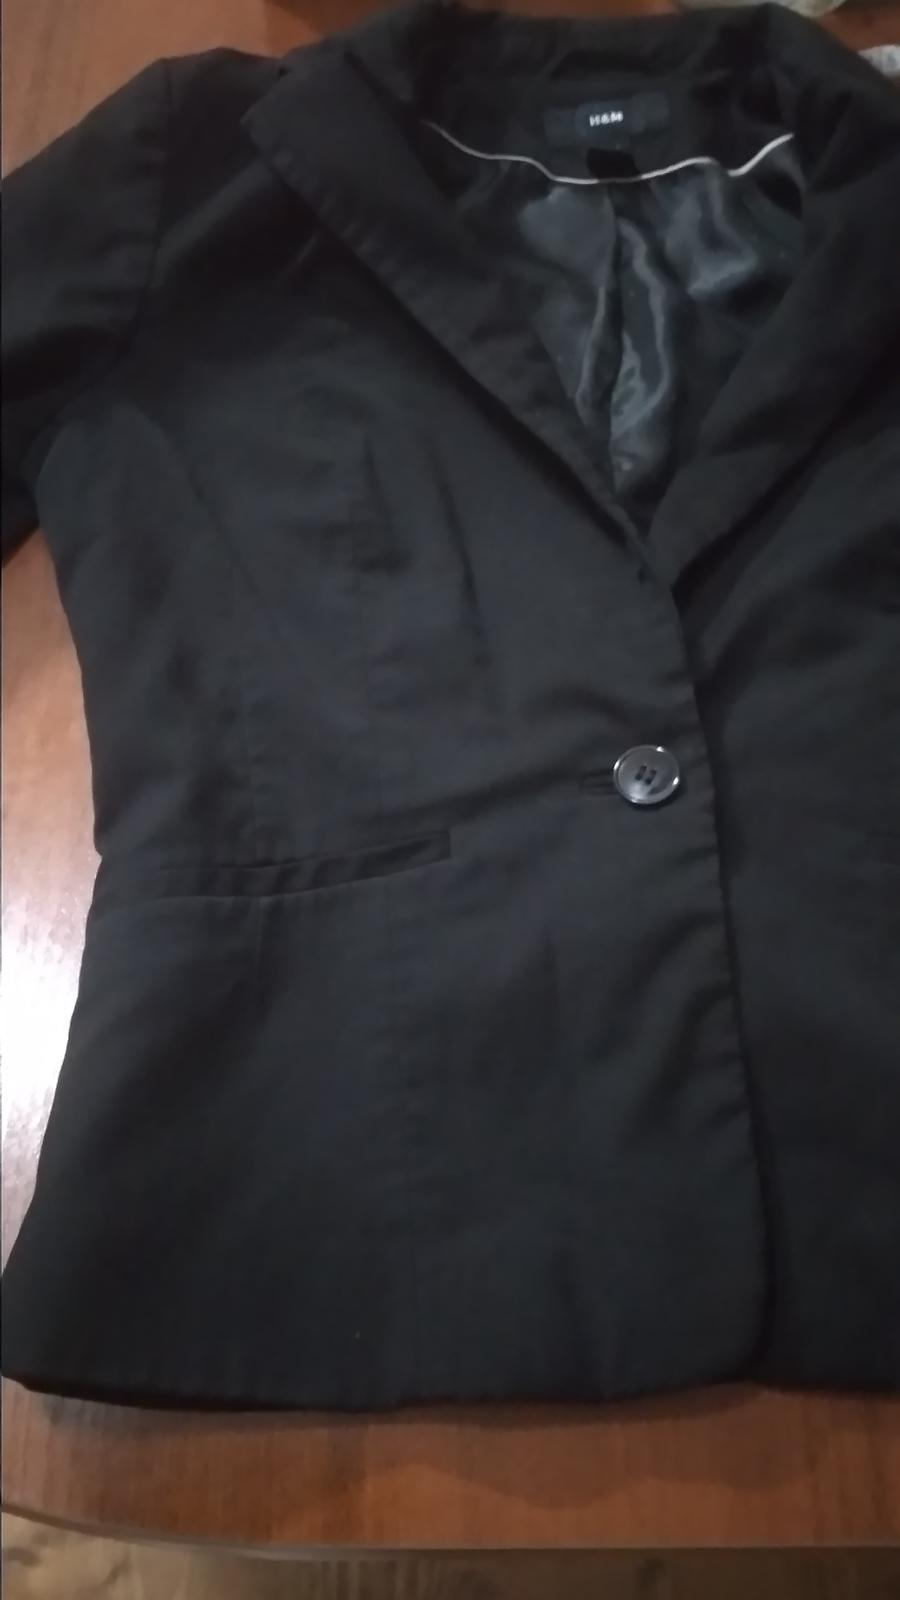 Čierne sako málinko nosené - Obrázok č. 1